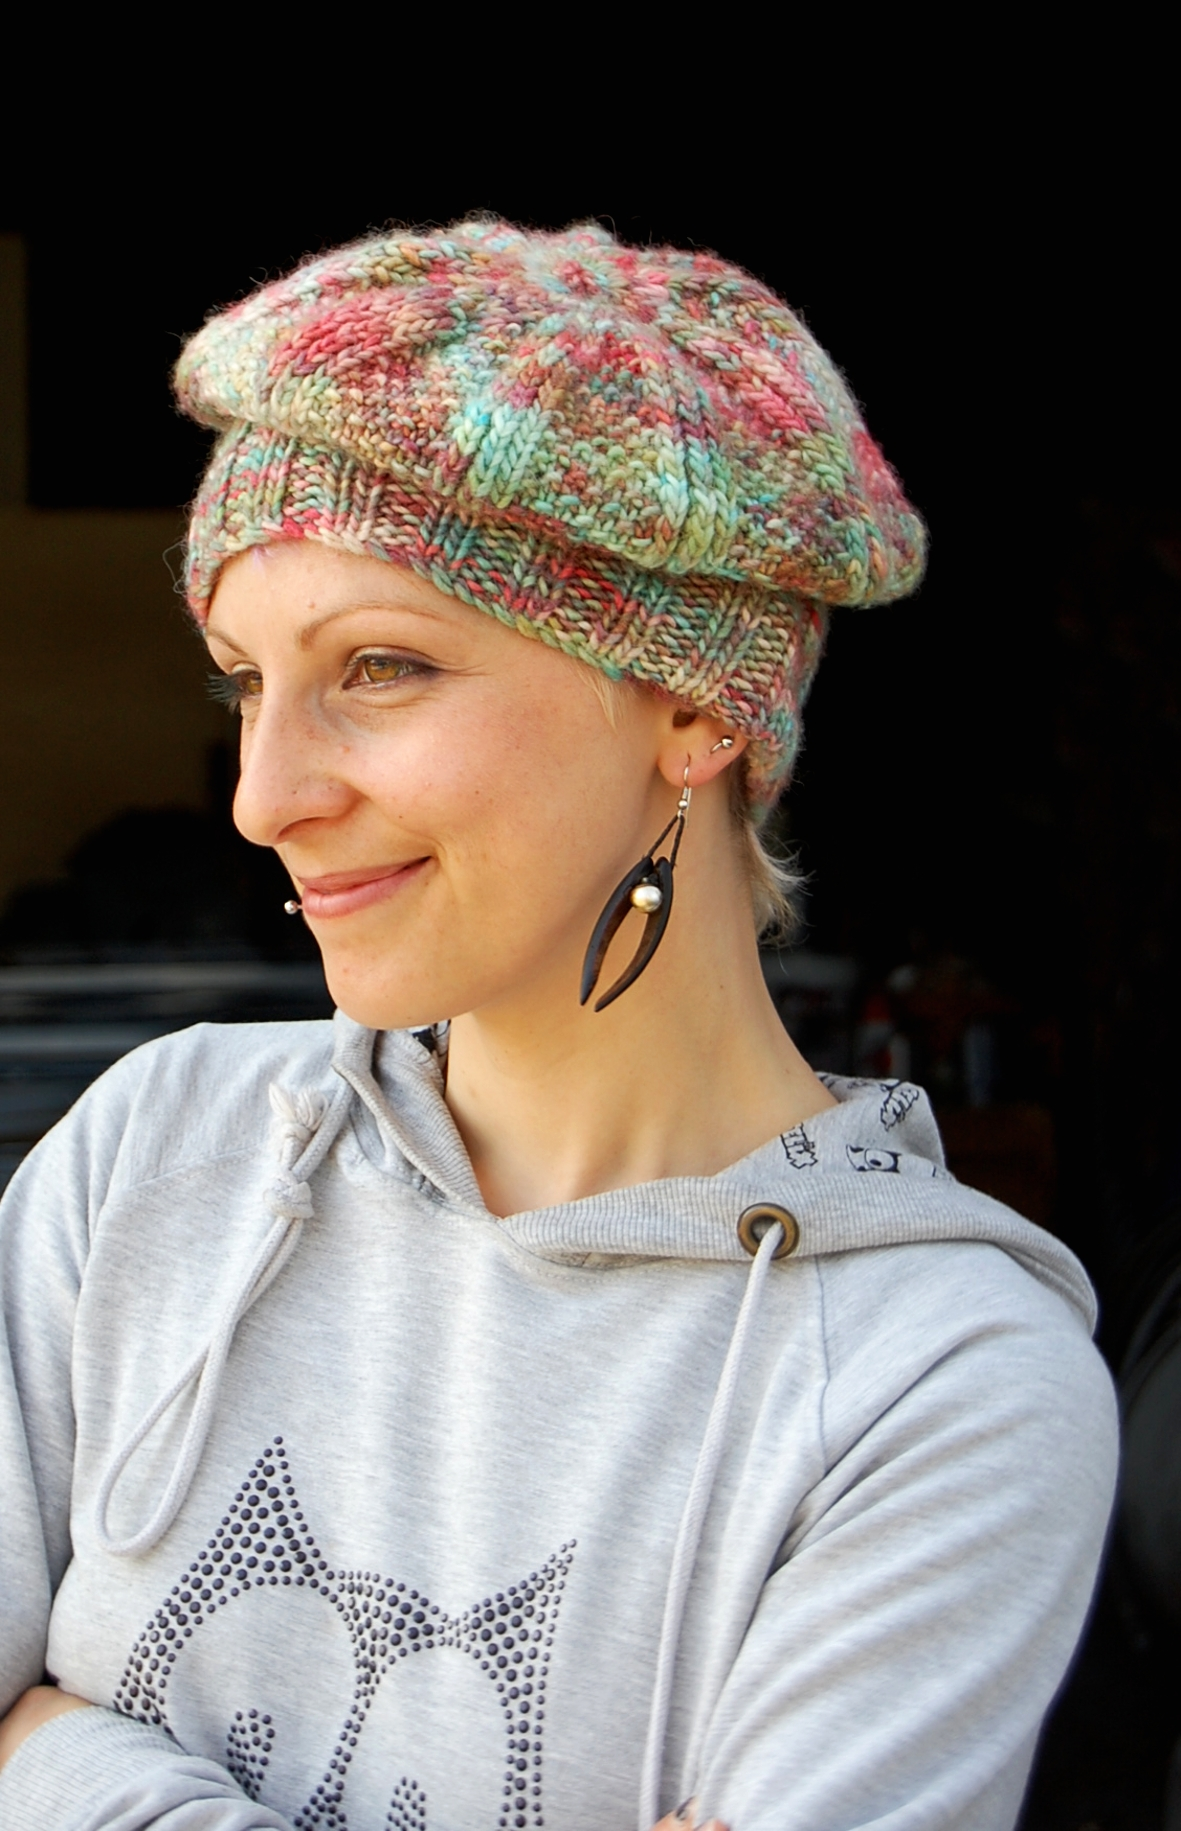 Marble Muffine slouchy beret knitting pattern